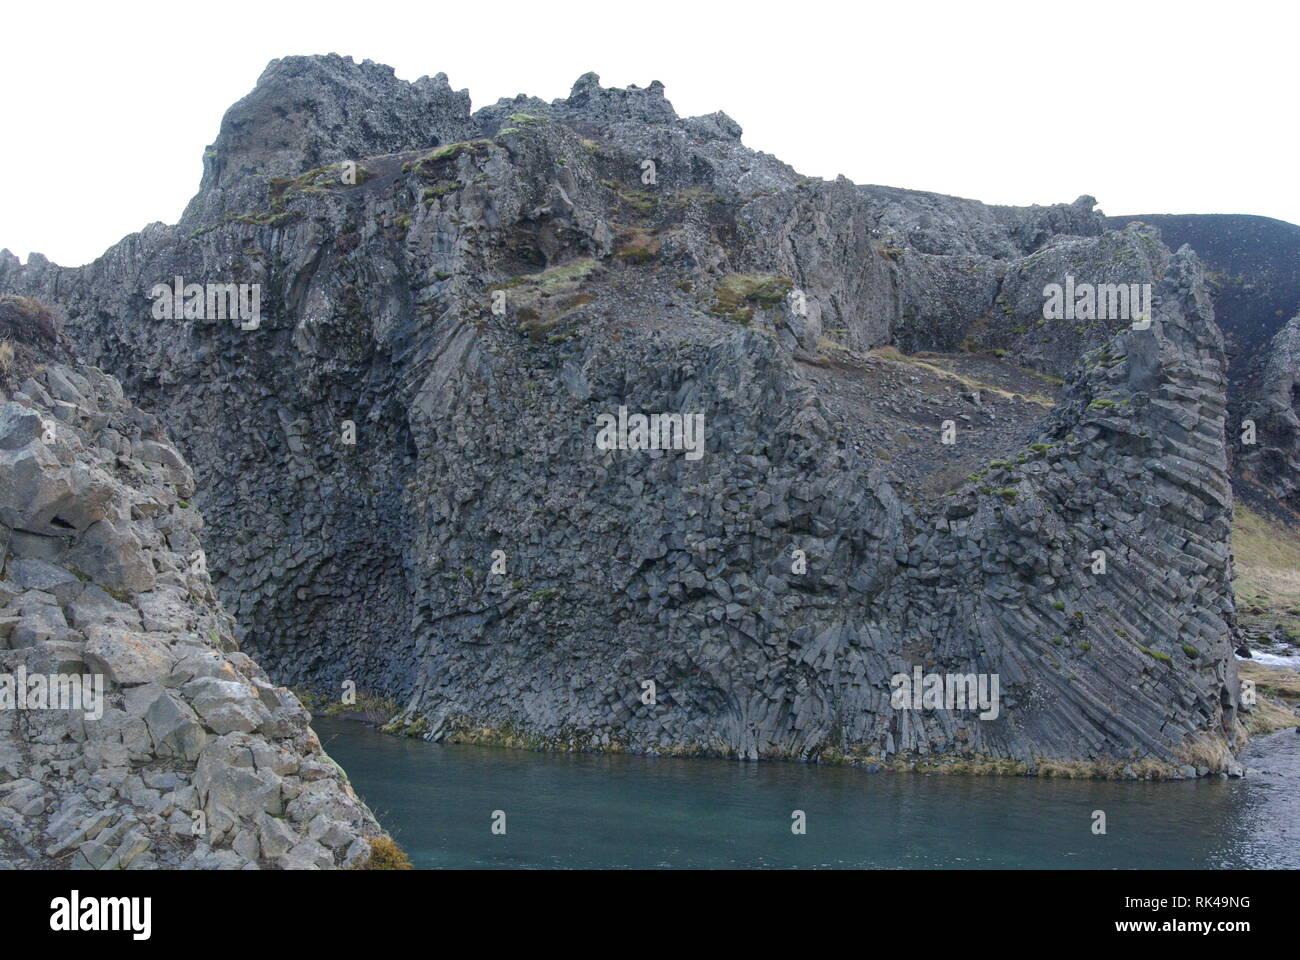 Hjalparfoss auf Island - Stock Image